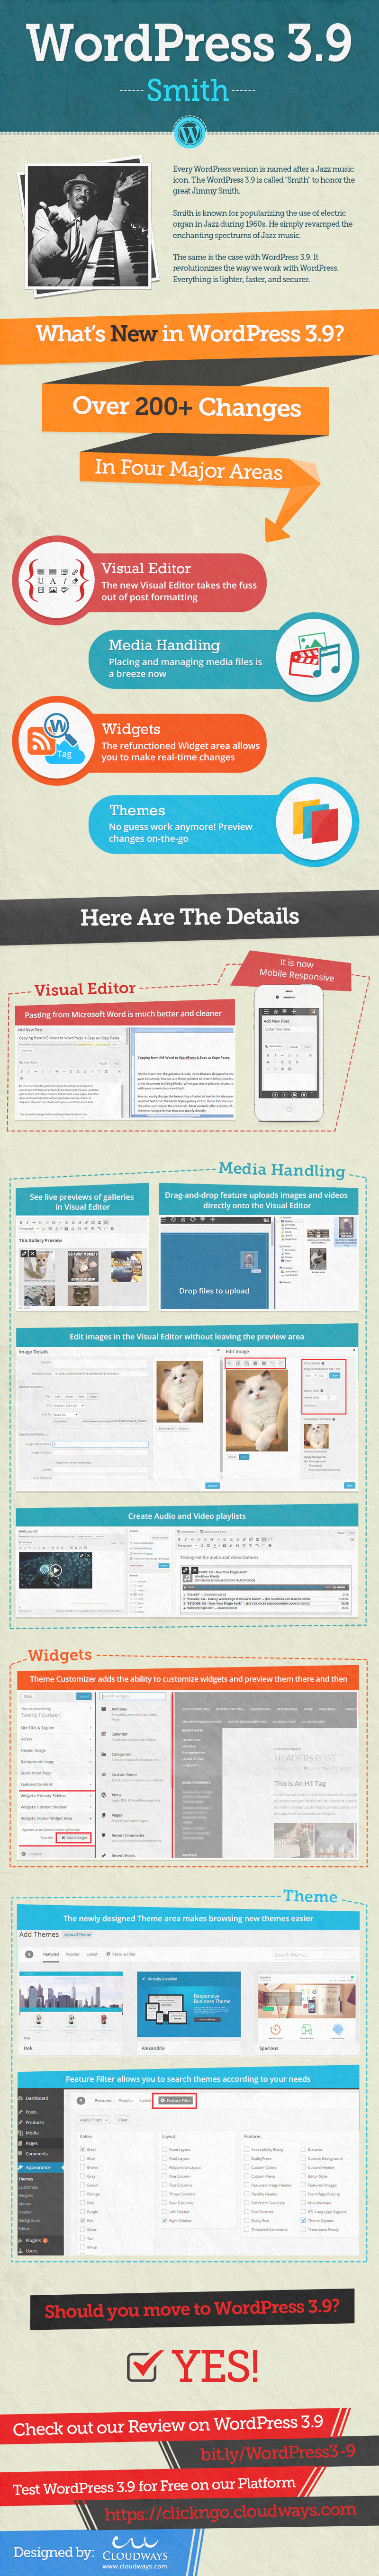 infografia wordpress 39